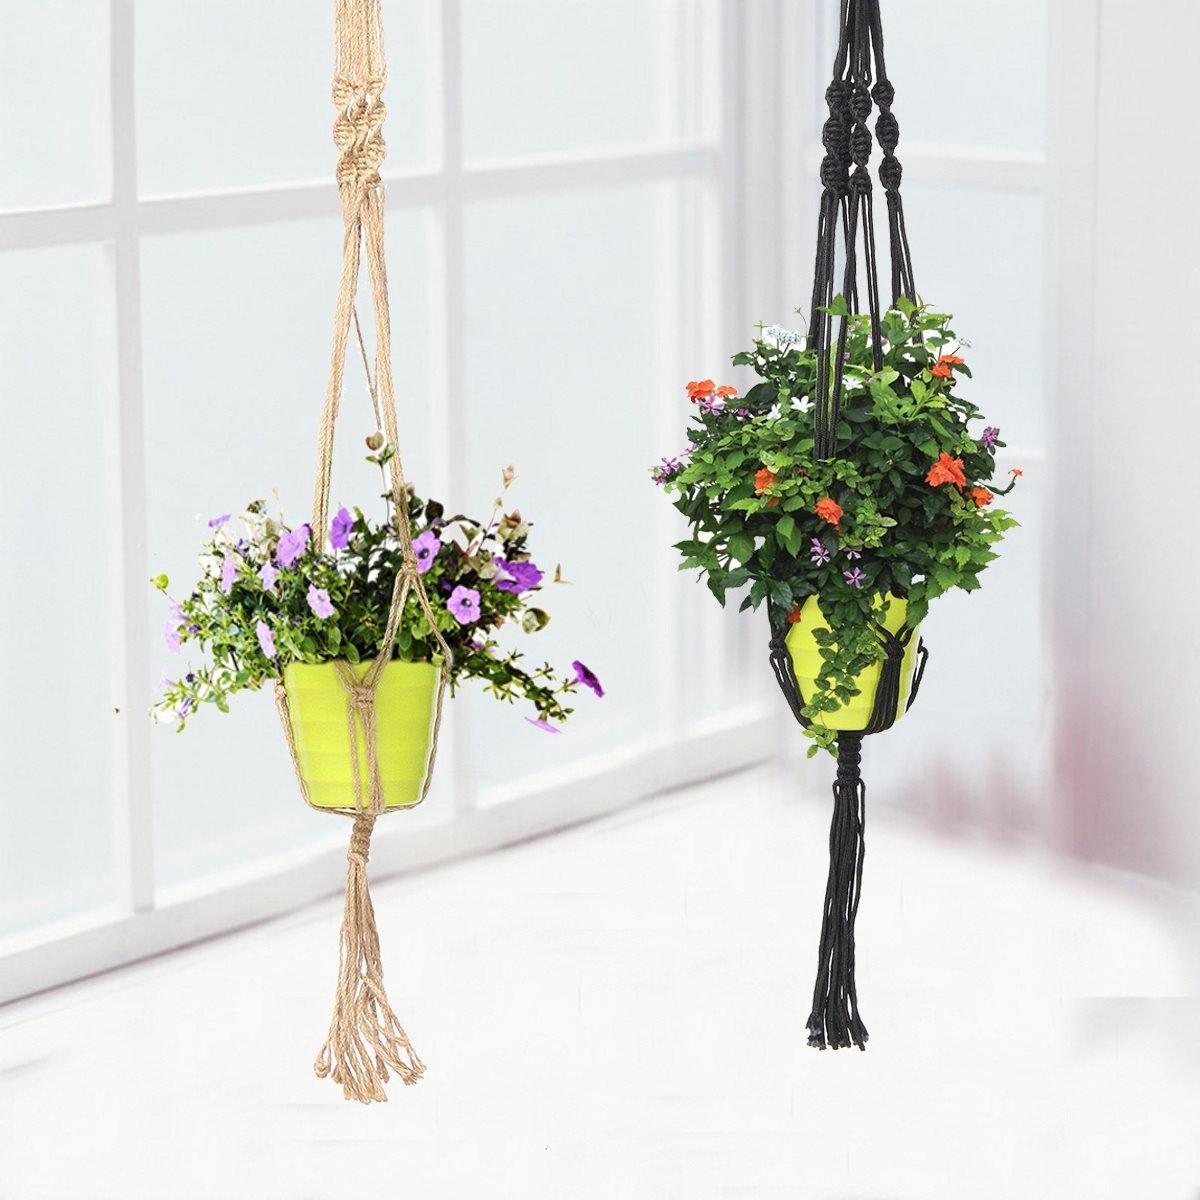 Blumenampel in verschiedenen Farben